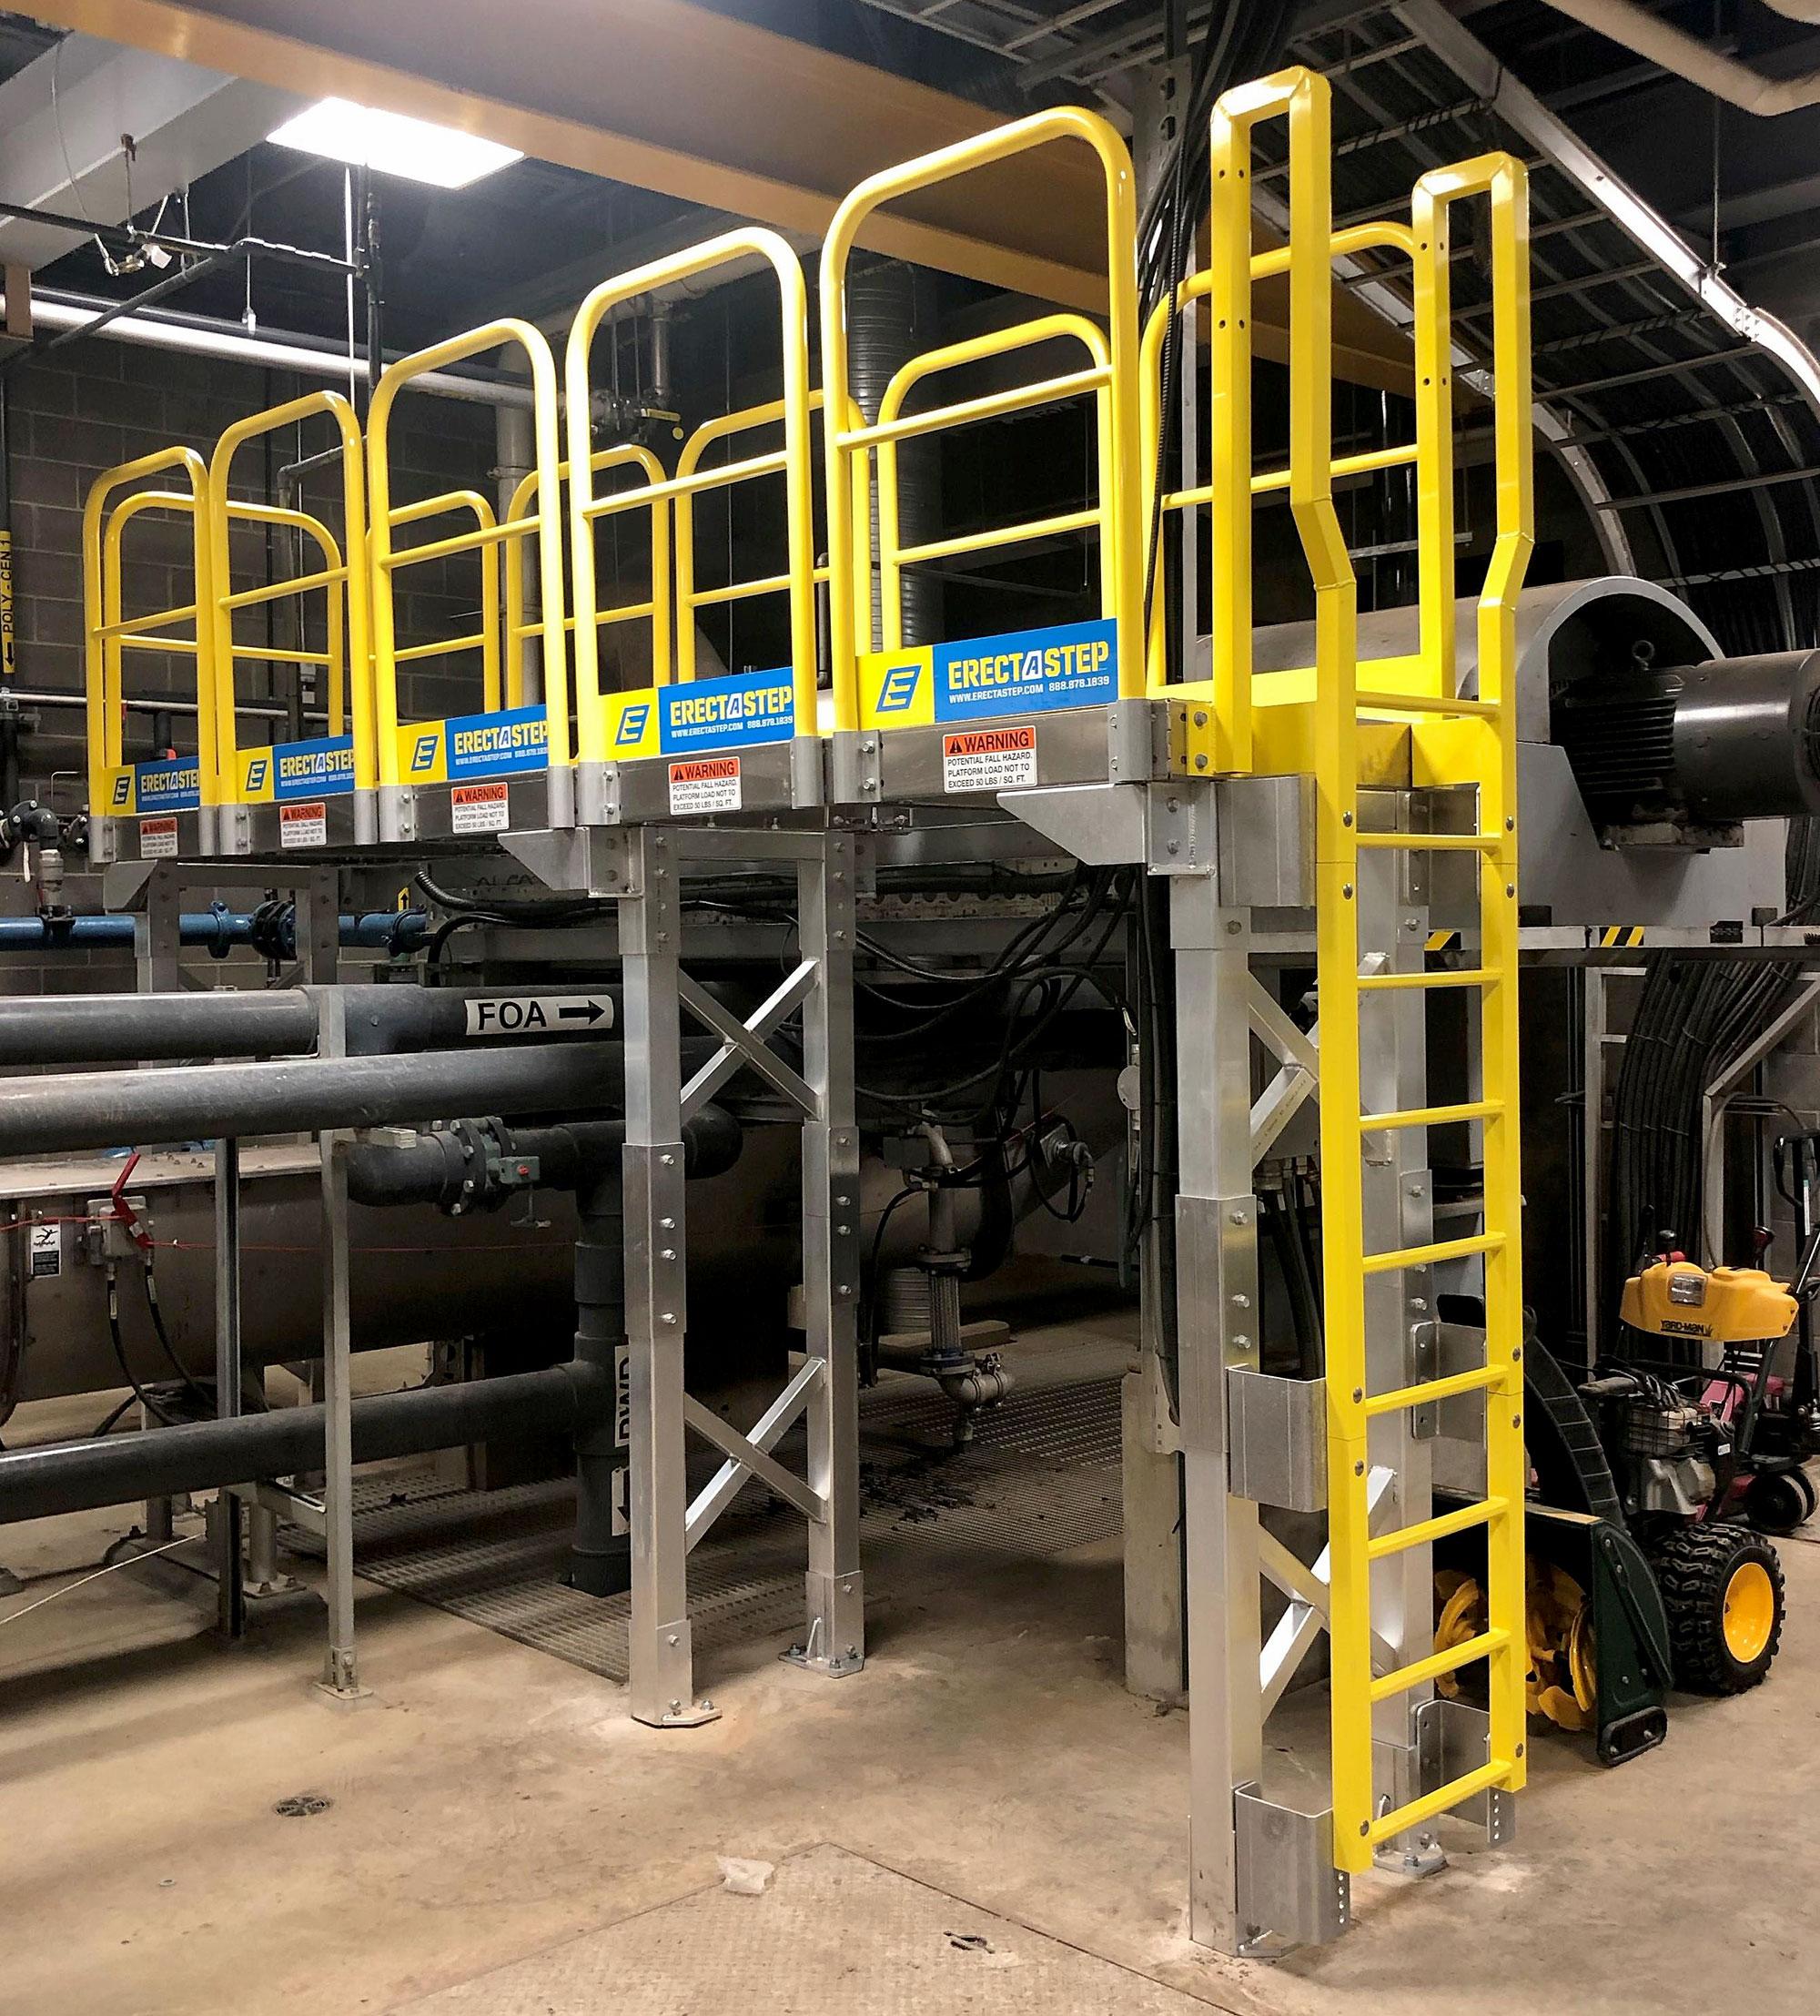 Work Platforms to Access Generators